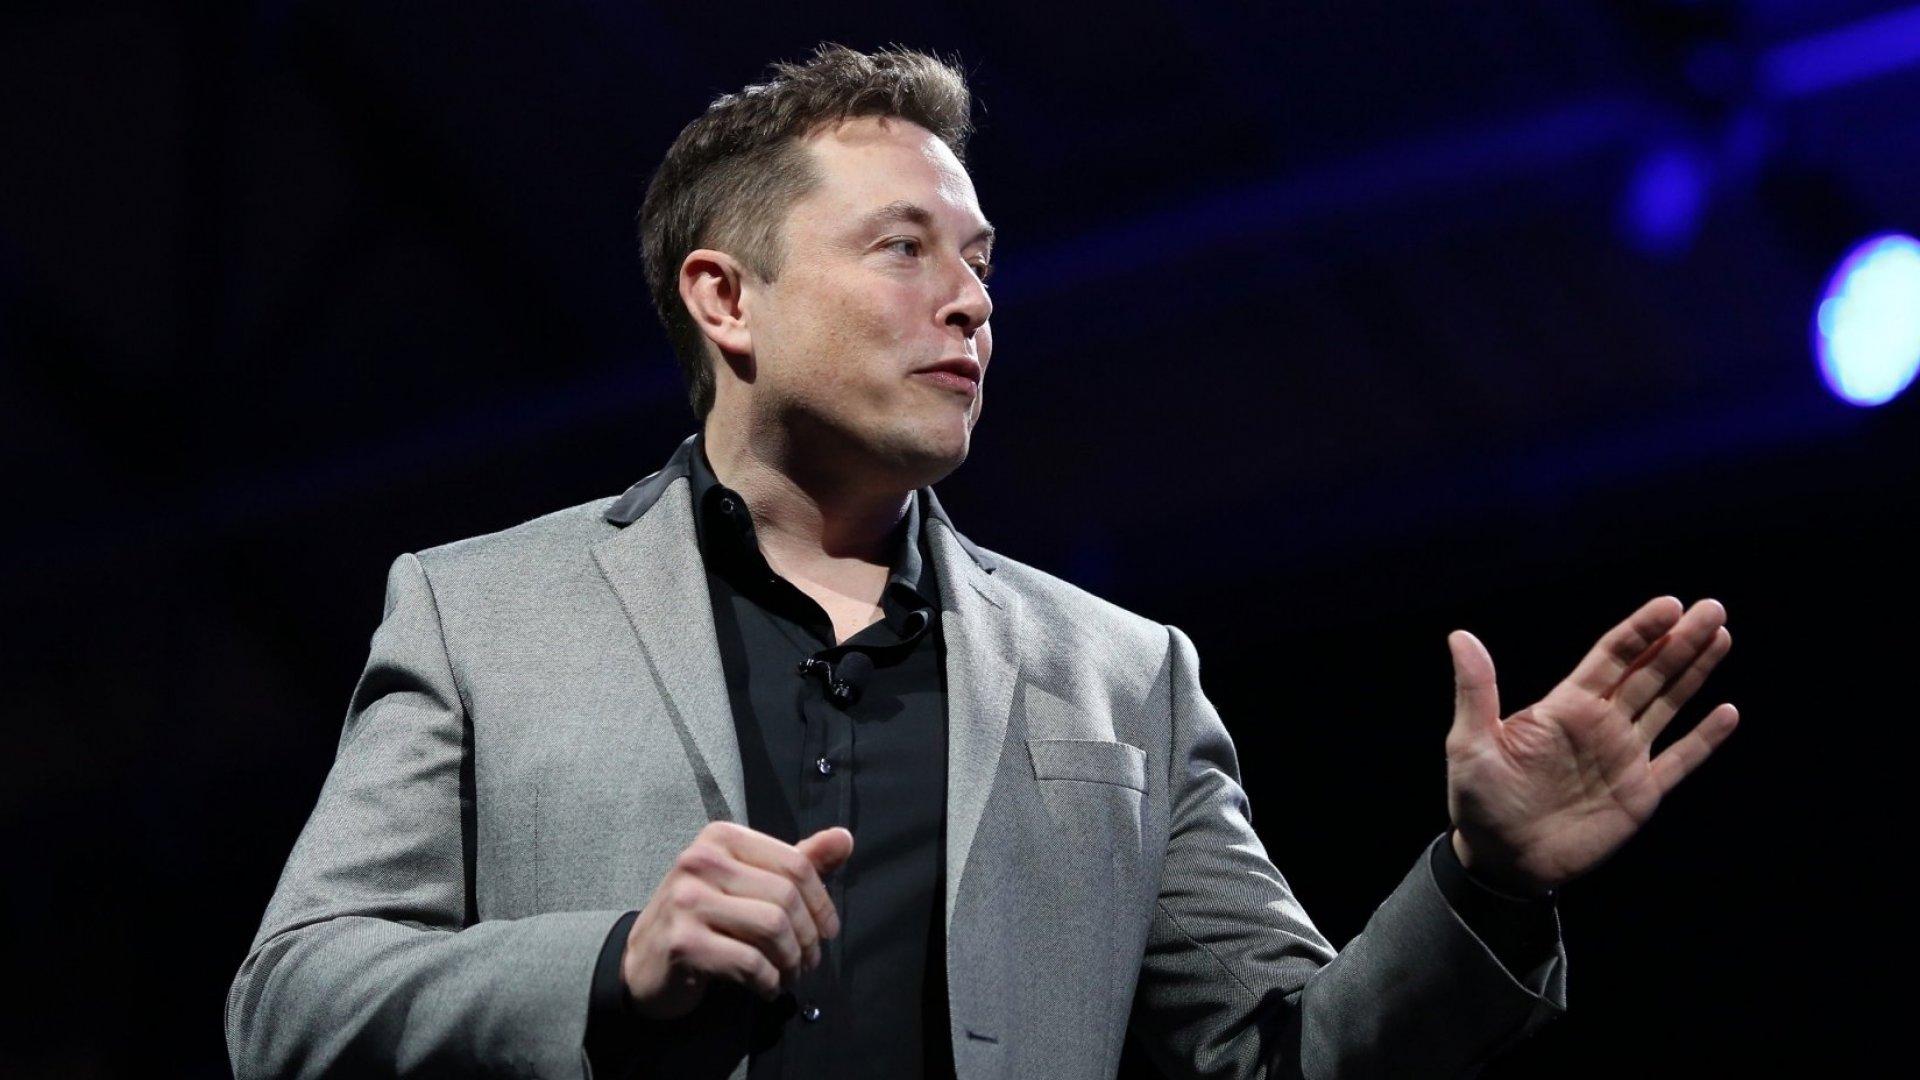 By Insulting His Critics, Elon Musk Made a Huge Mistake. Steve Jobs Showed a Better Way